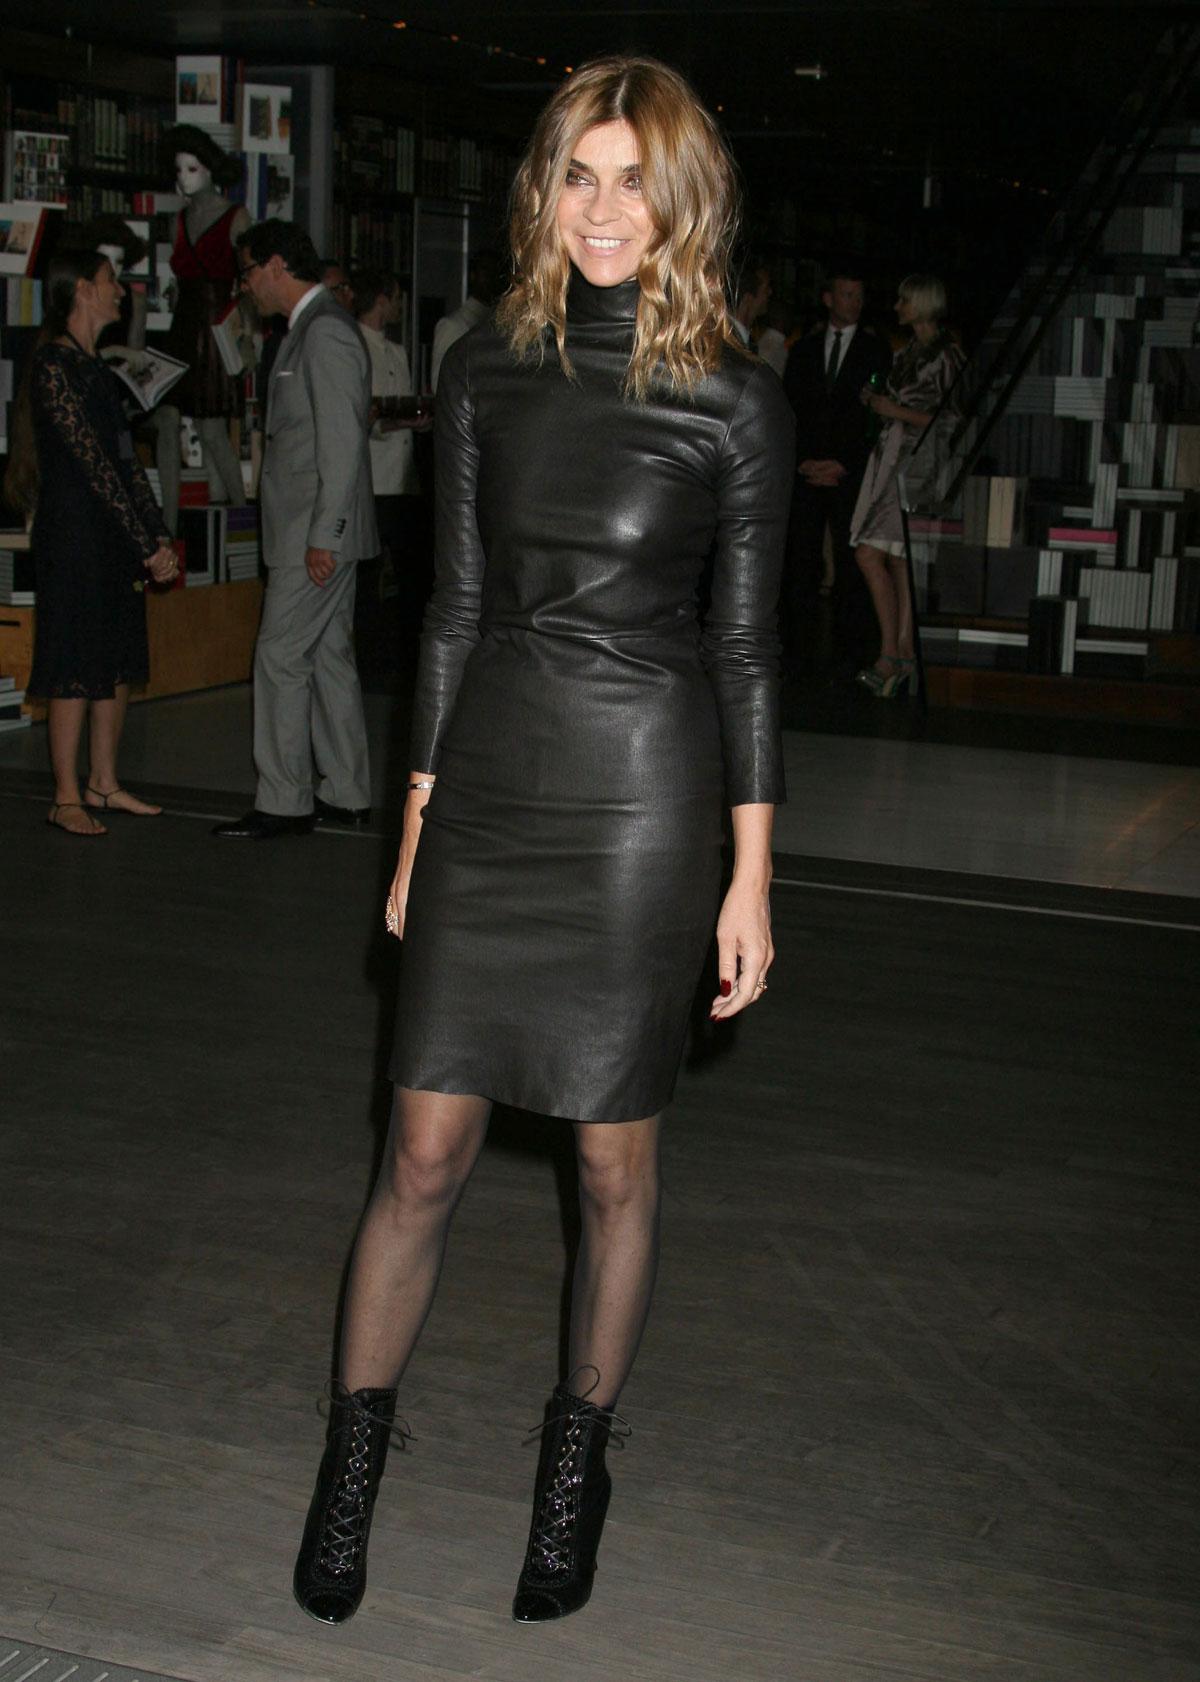 Carine Roitfeld attends Prada book launch cocktail